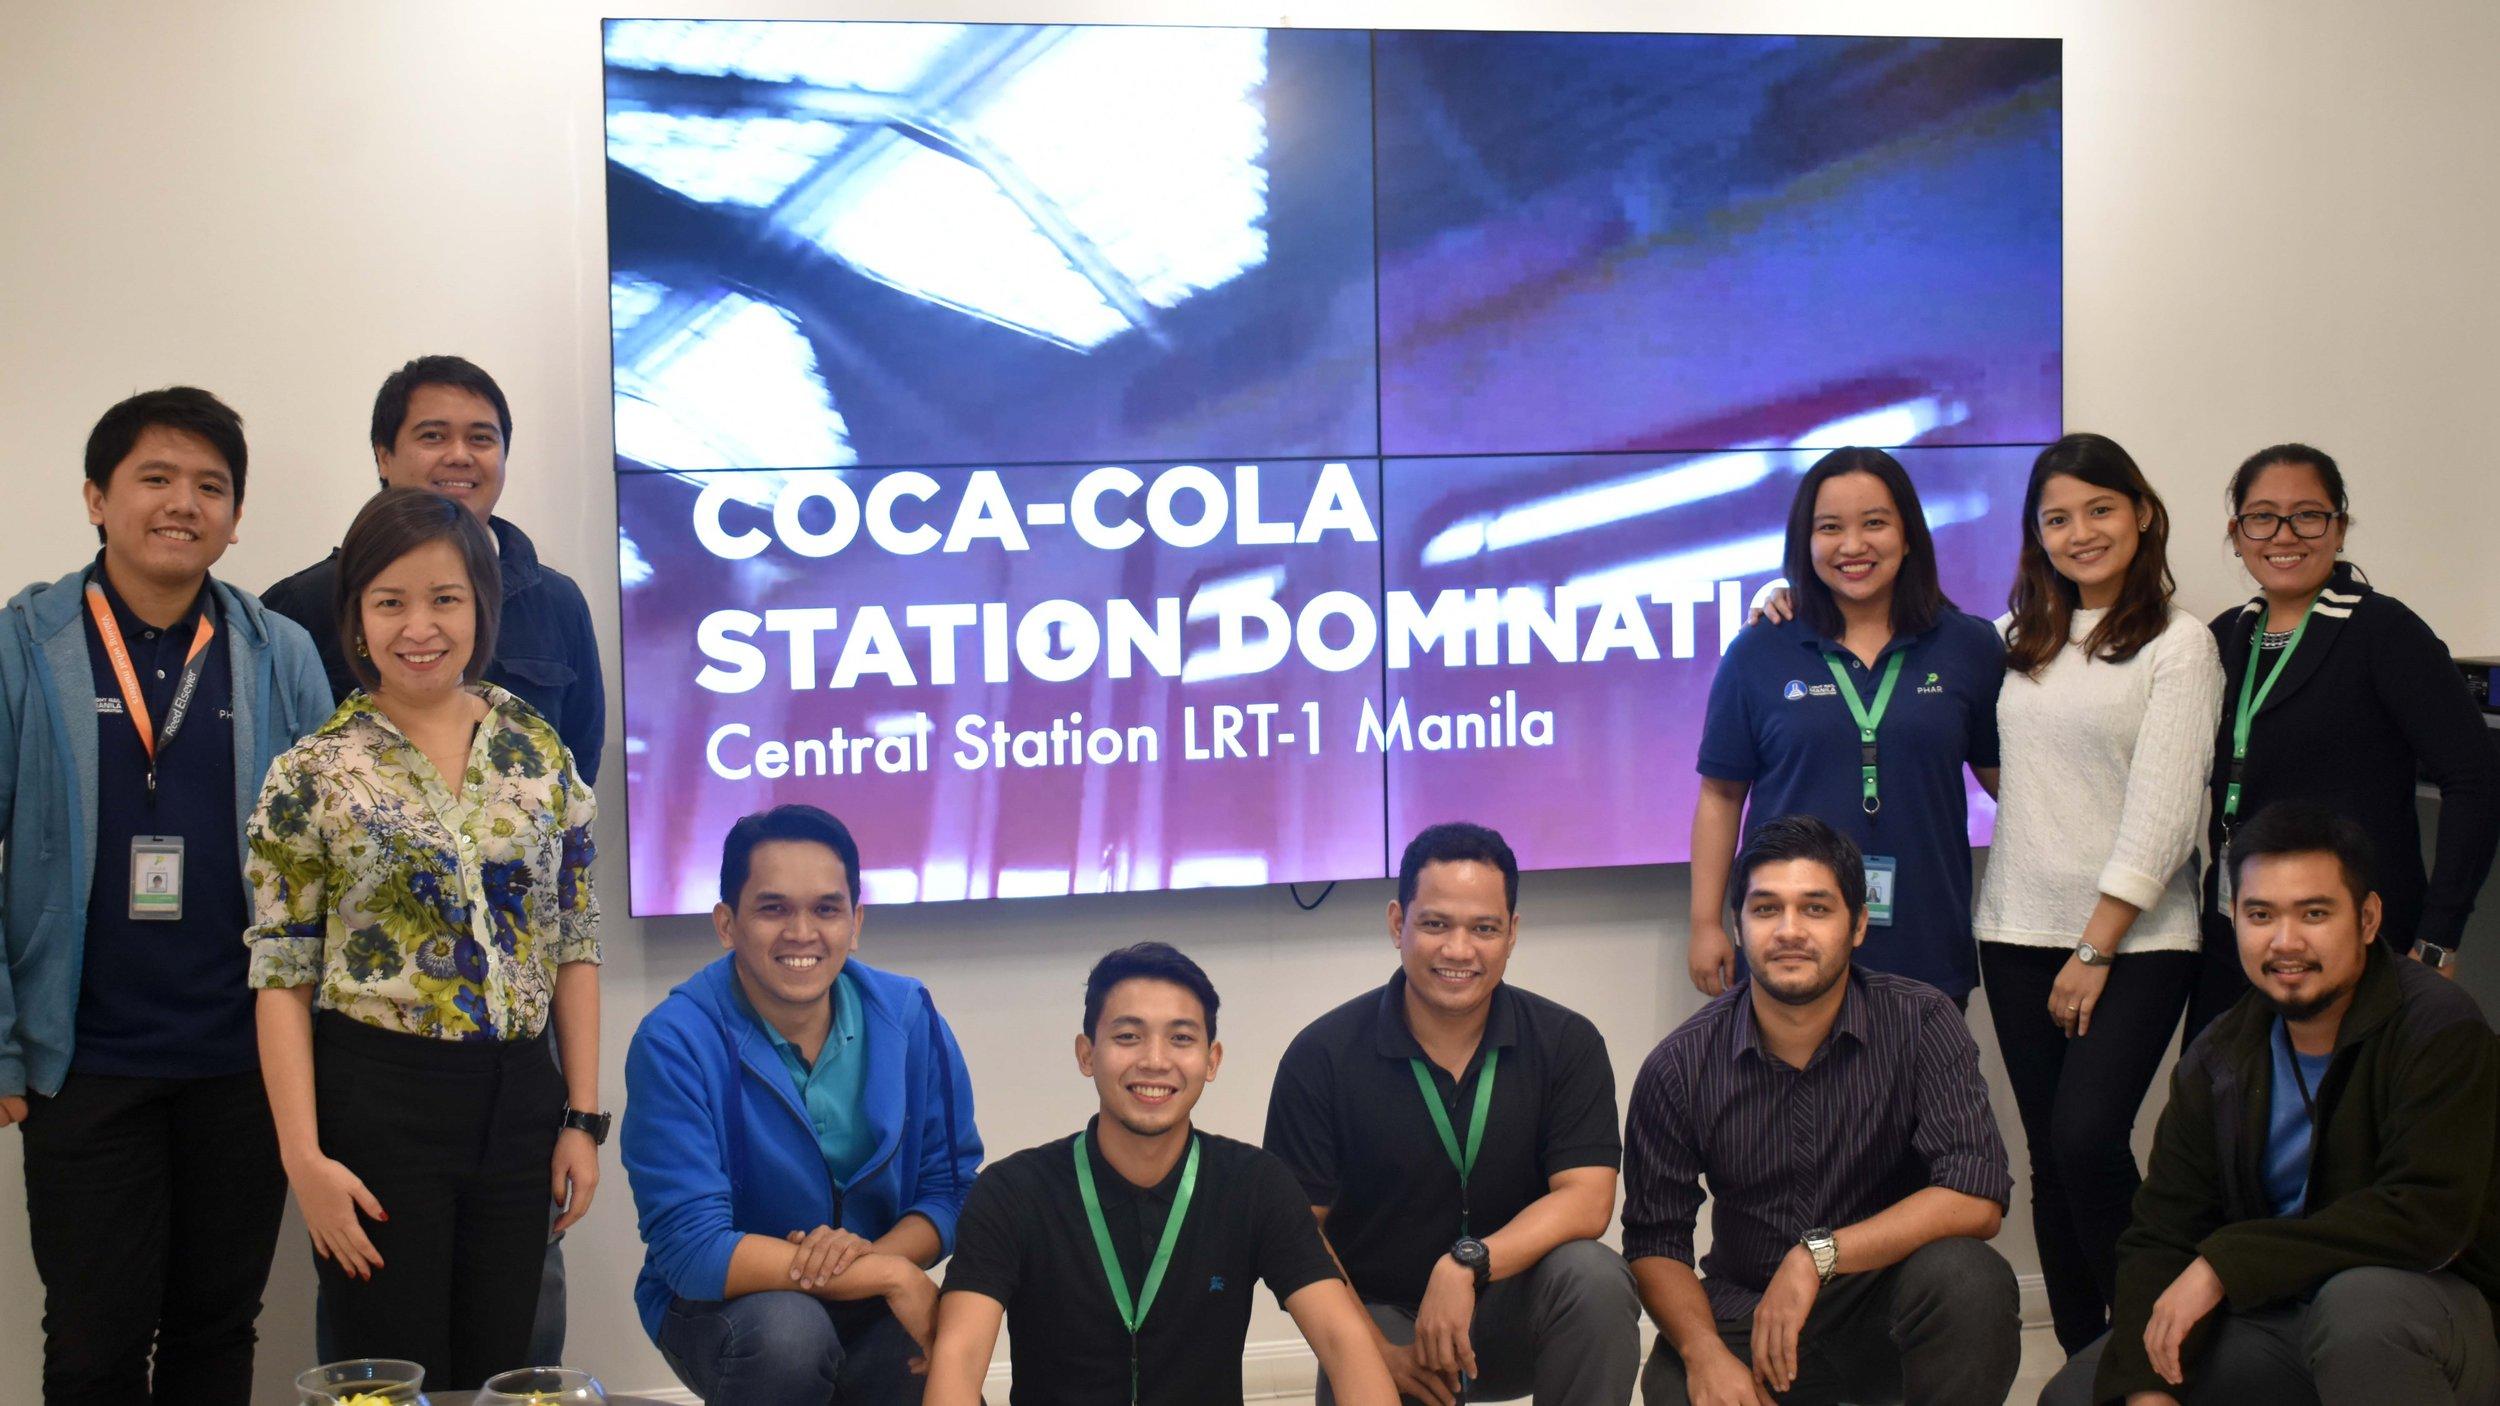 5c205-coke02.jpg